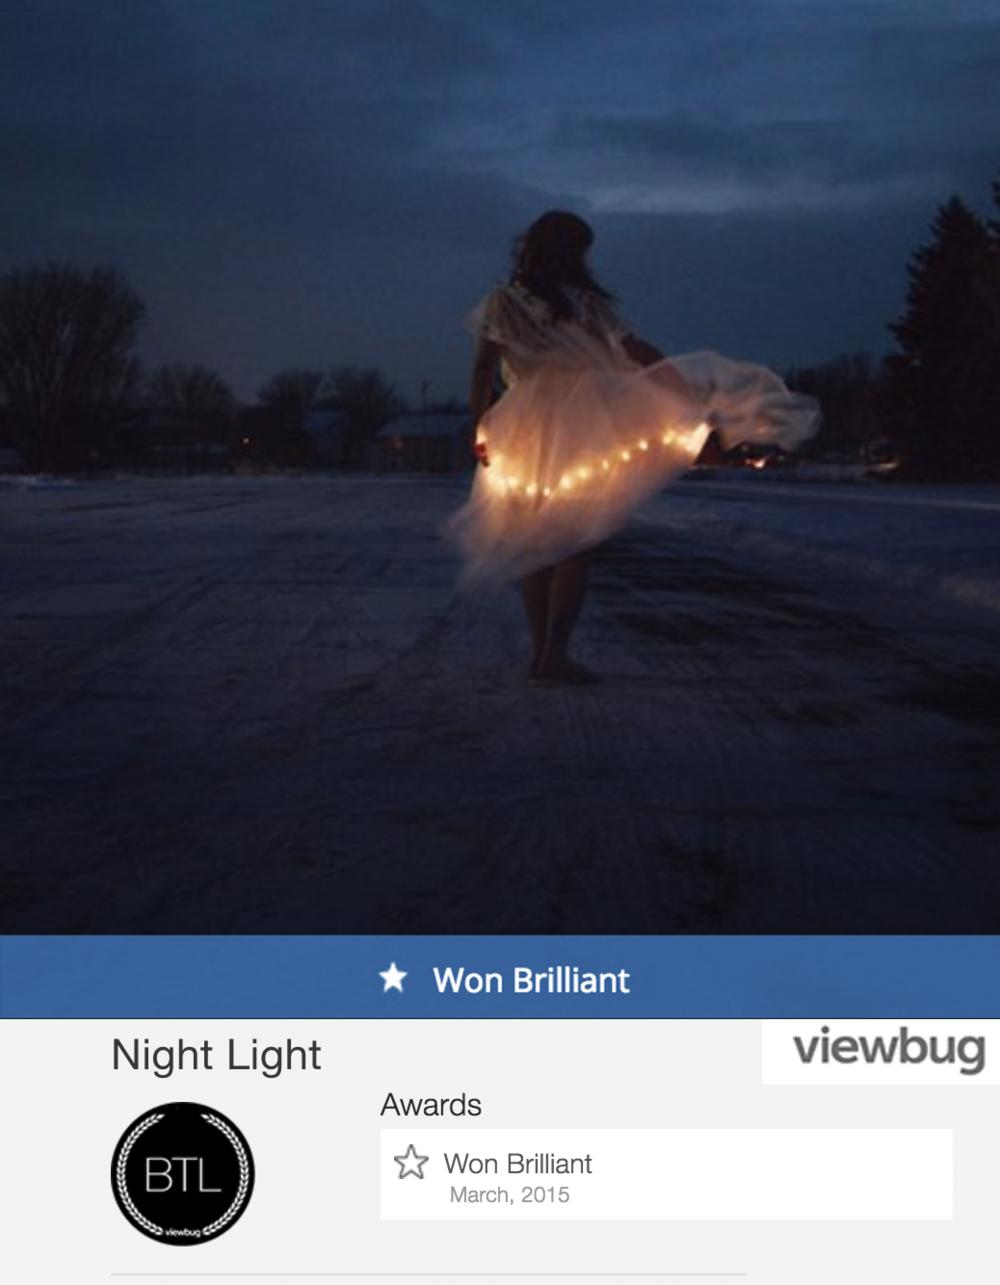 ViewBug - Won Brilliant 2015  https://www.viewbug.com/photo/43345081